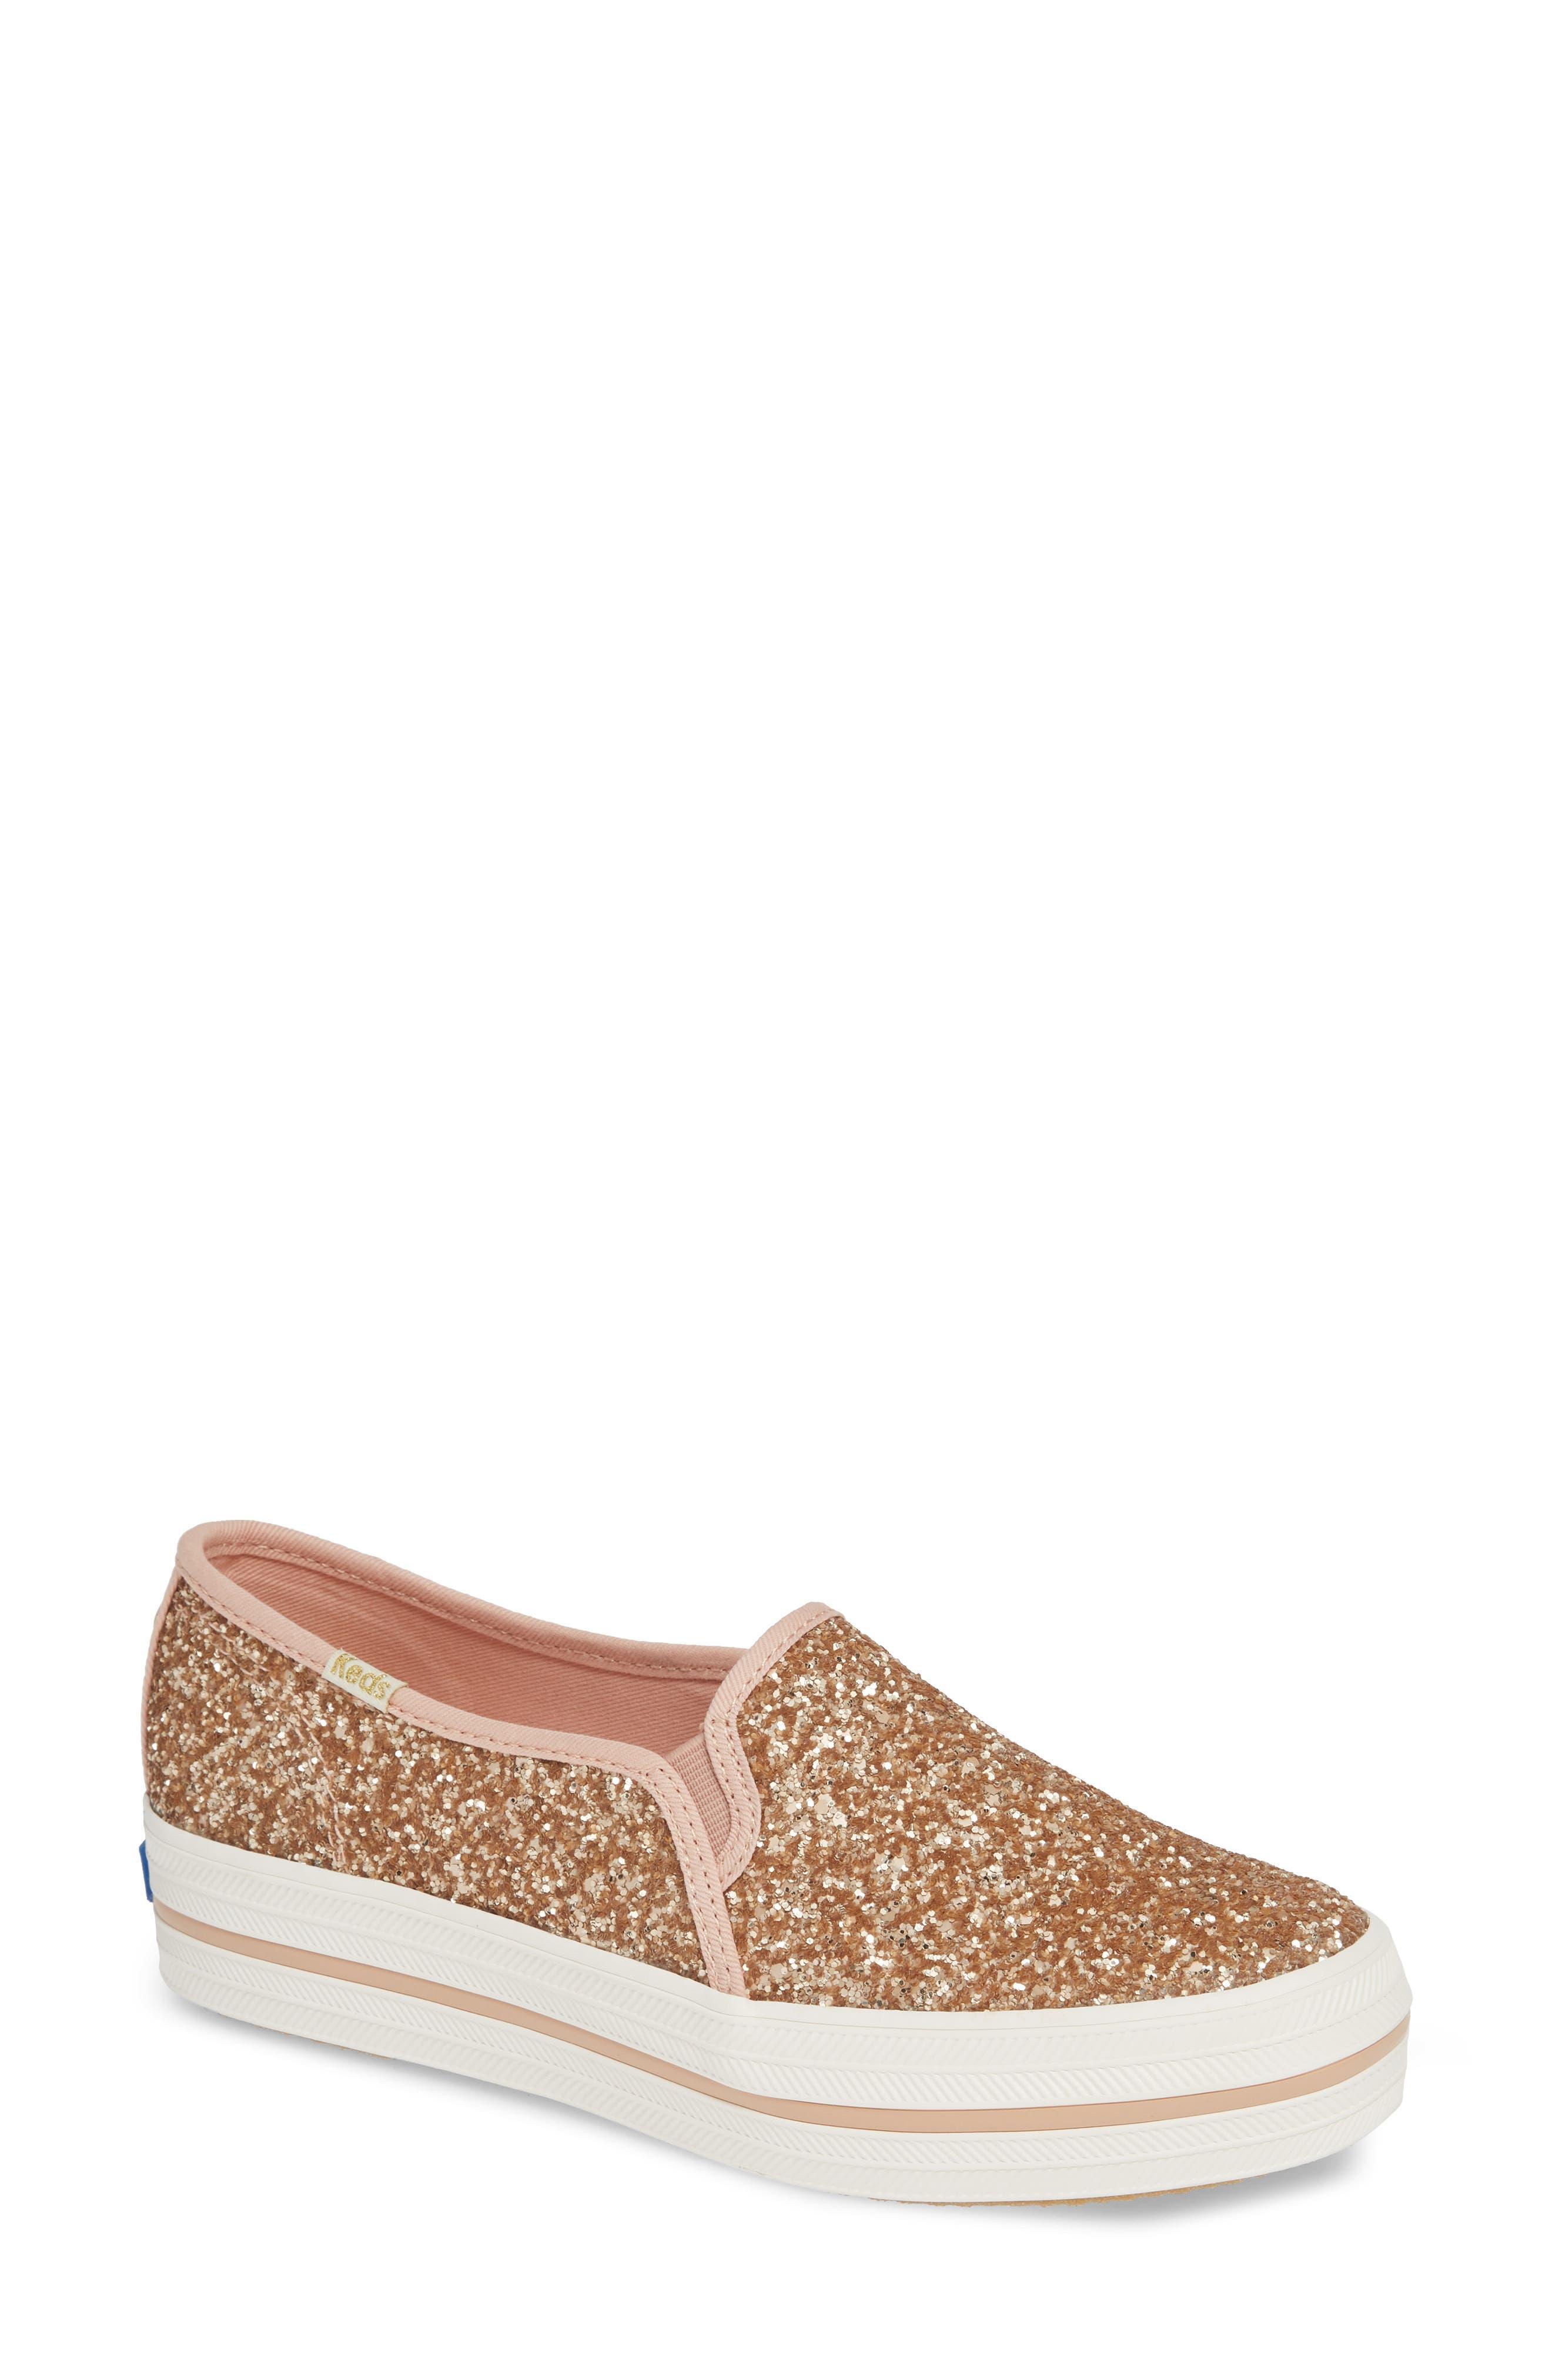 KEDS<SUP>®</SUP> FOR KATE SPADE NEW YORK, triple decker glitter slip-on sneaker, Main thumbnail 1, color, ROSE GOLD